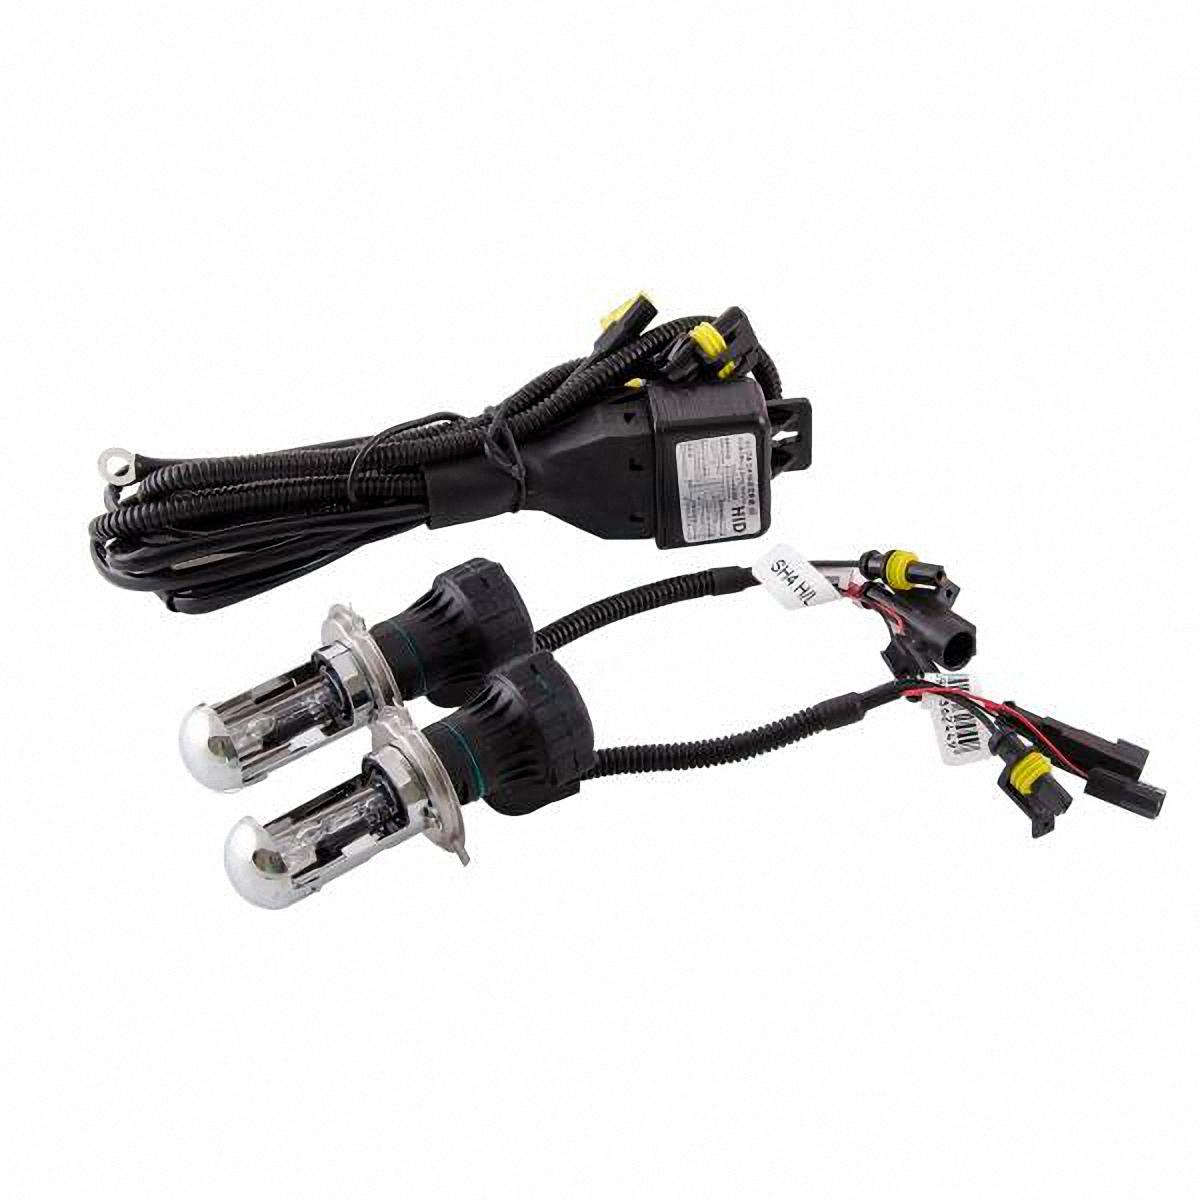 Skyway Автолампа би-ксенон H4. SH4 H/L 5000KS03301004Комплектация: Лампа газоразрядная би-ксеноновая – 2 шт. Провод питания – 1 шт. Гарантийный талон – 1 шт.